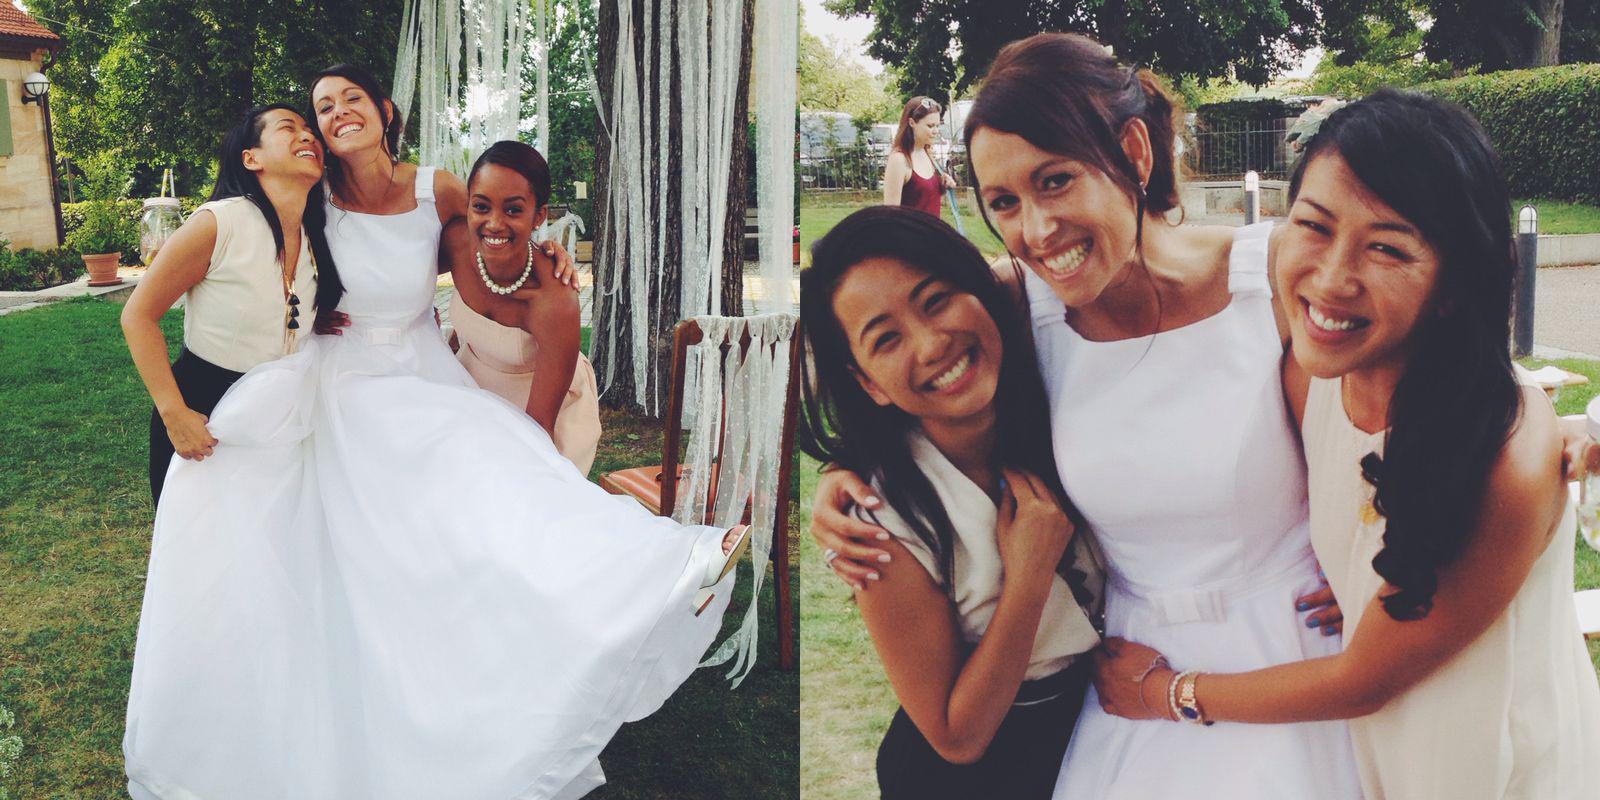 Jenny-Ordning-Chris-Langner-Wedding-Ibtisam-Omer-Hsiu-Ching-The-Wong-Janice.jpg